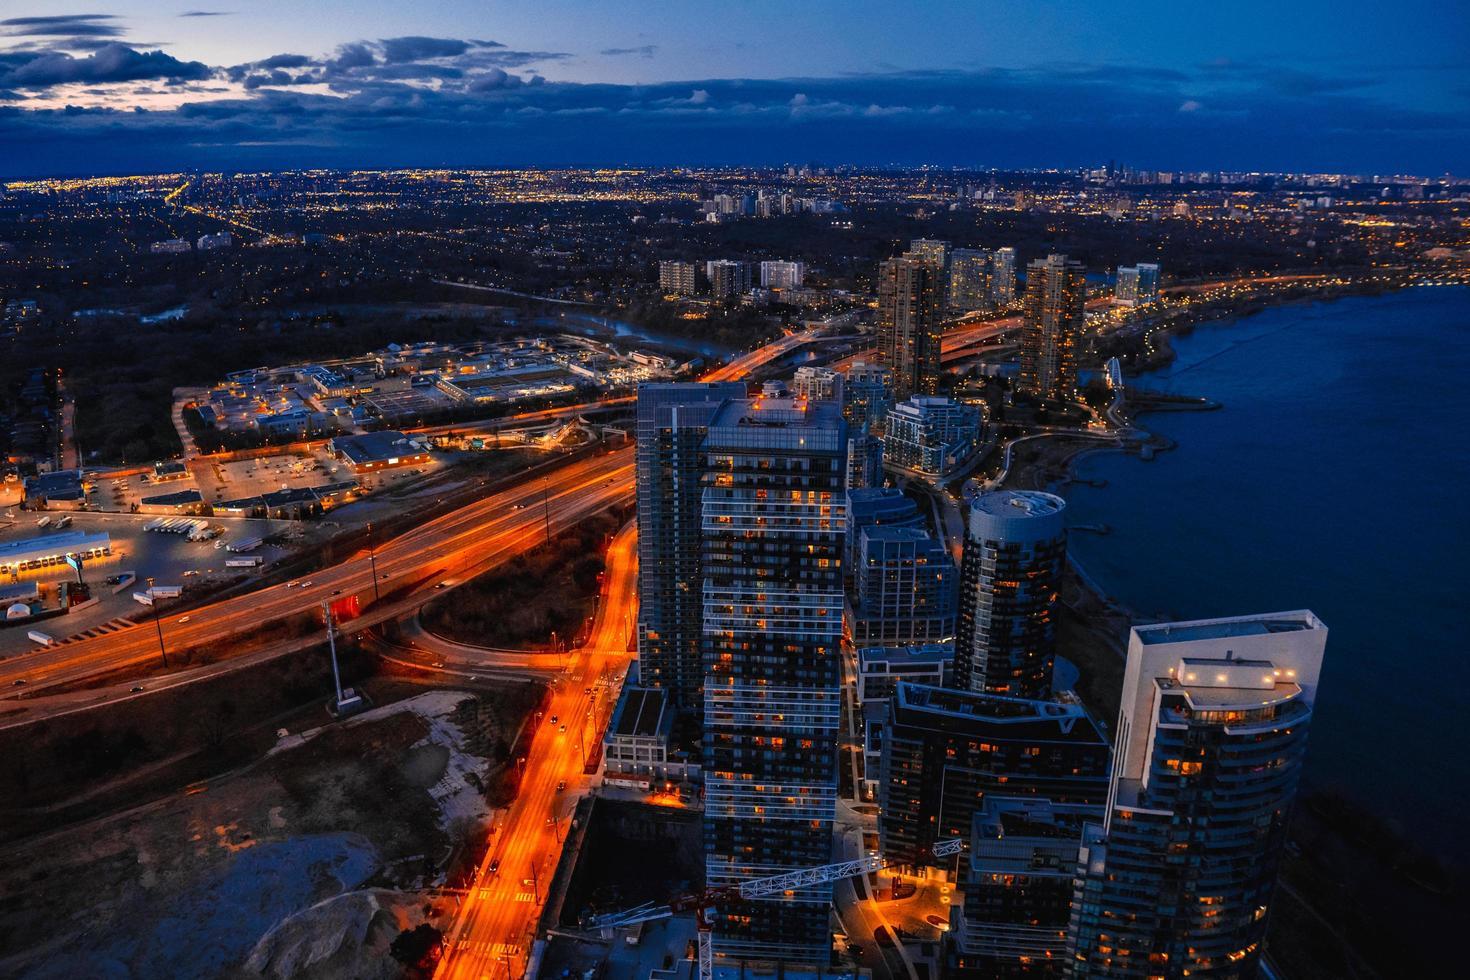 Aerial view of Toronto, Canada photo